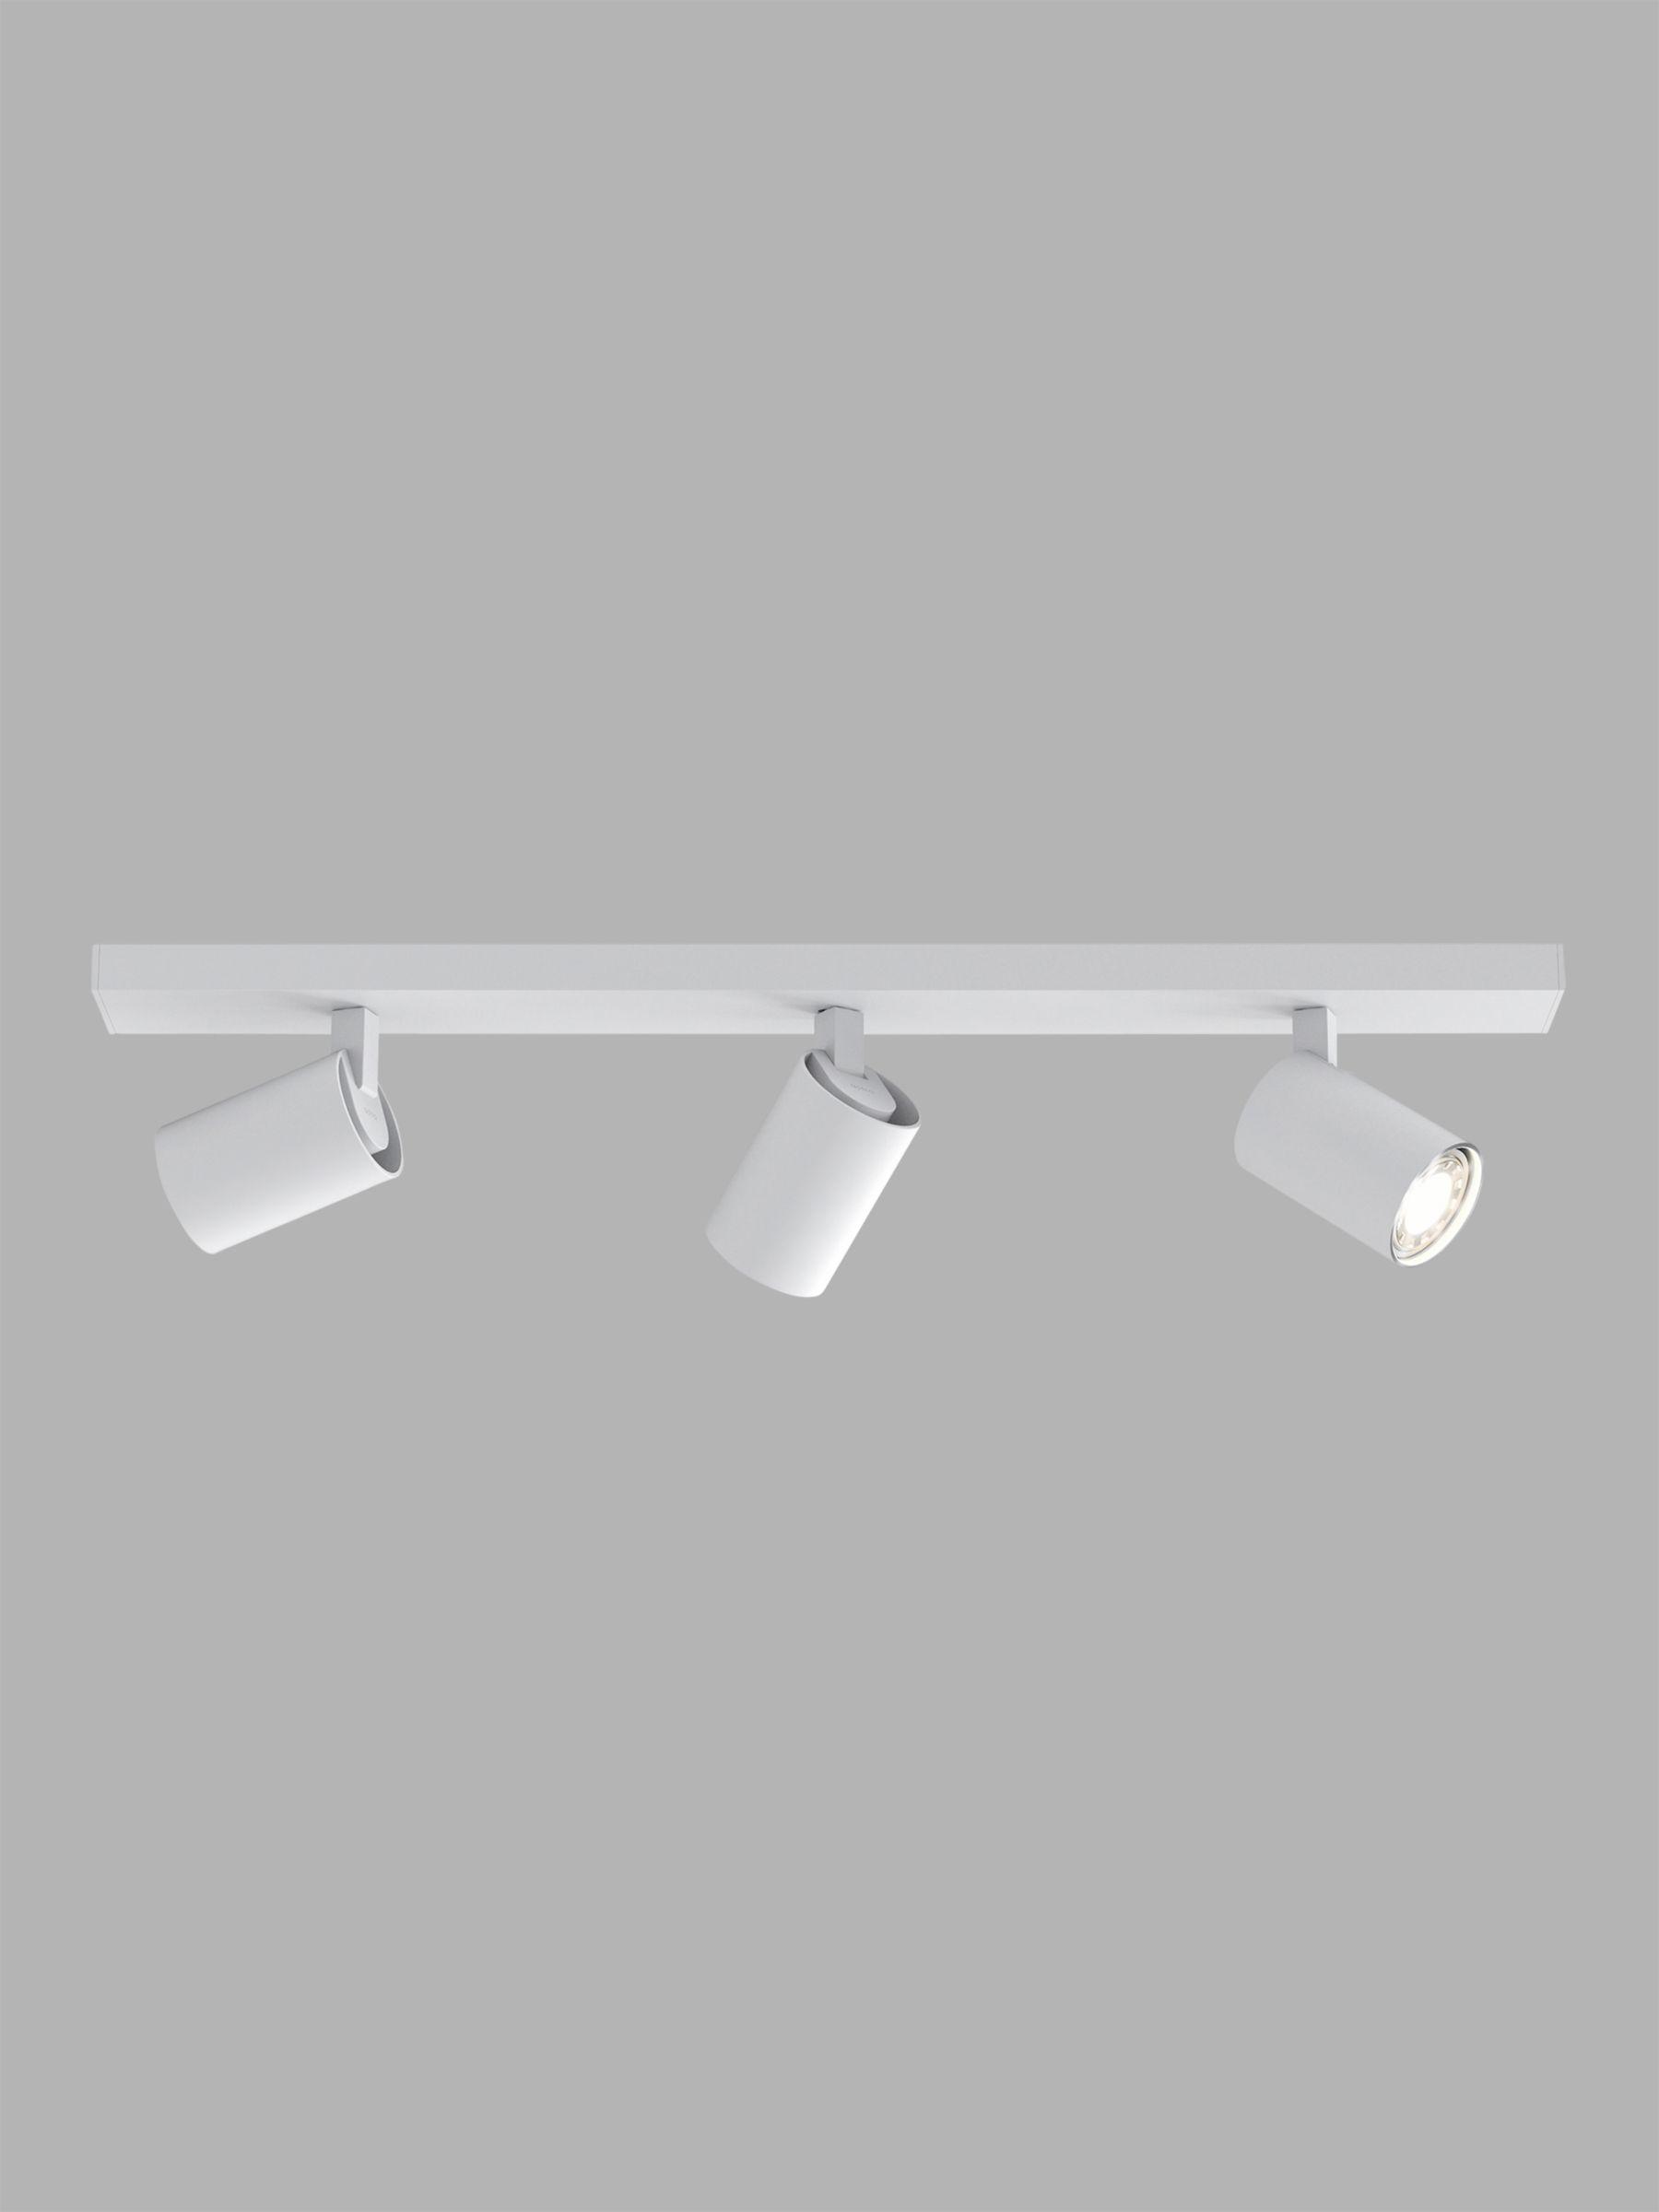 ASTRO Astro Ascoli 3 Spotlight Ceiling Bar, White